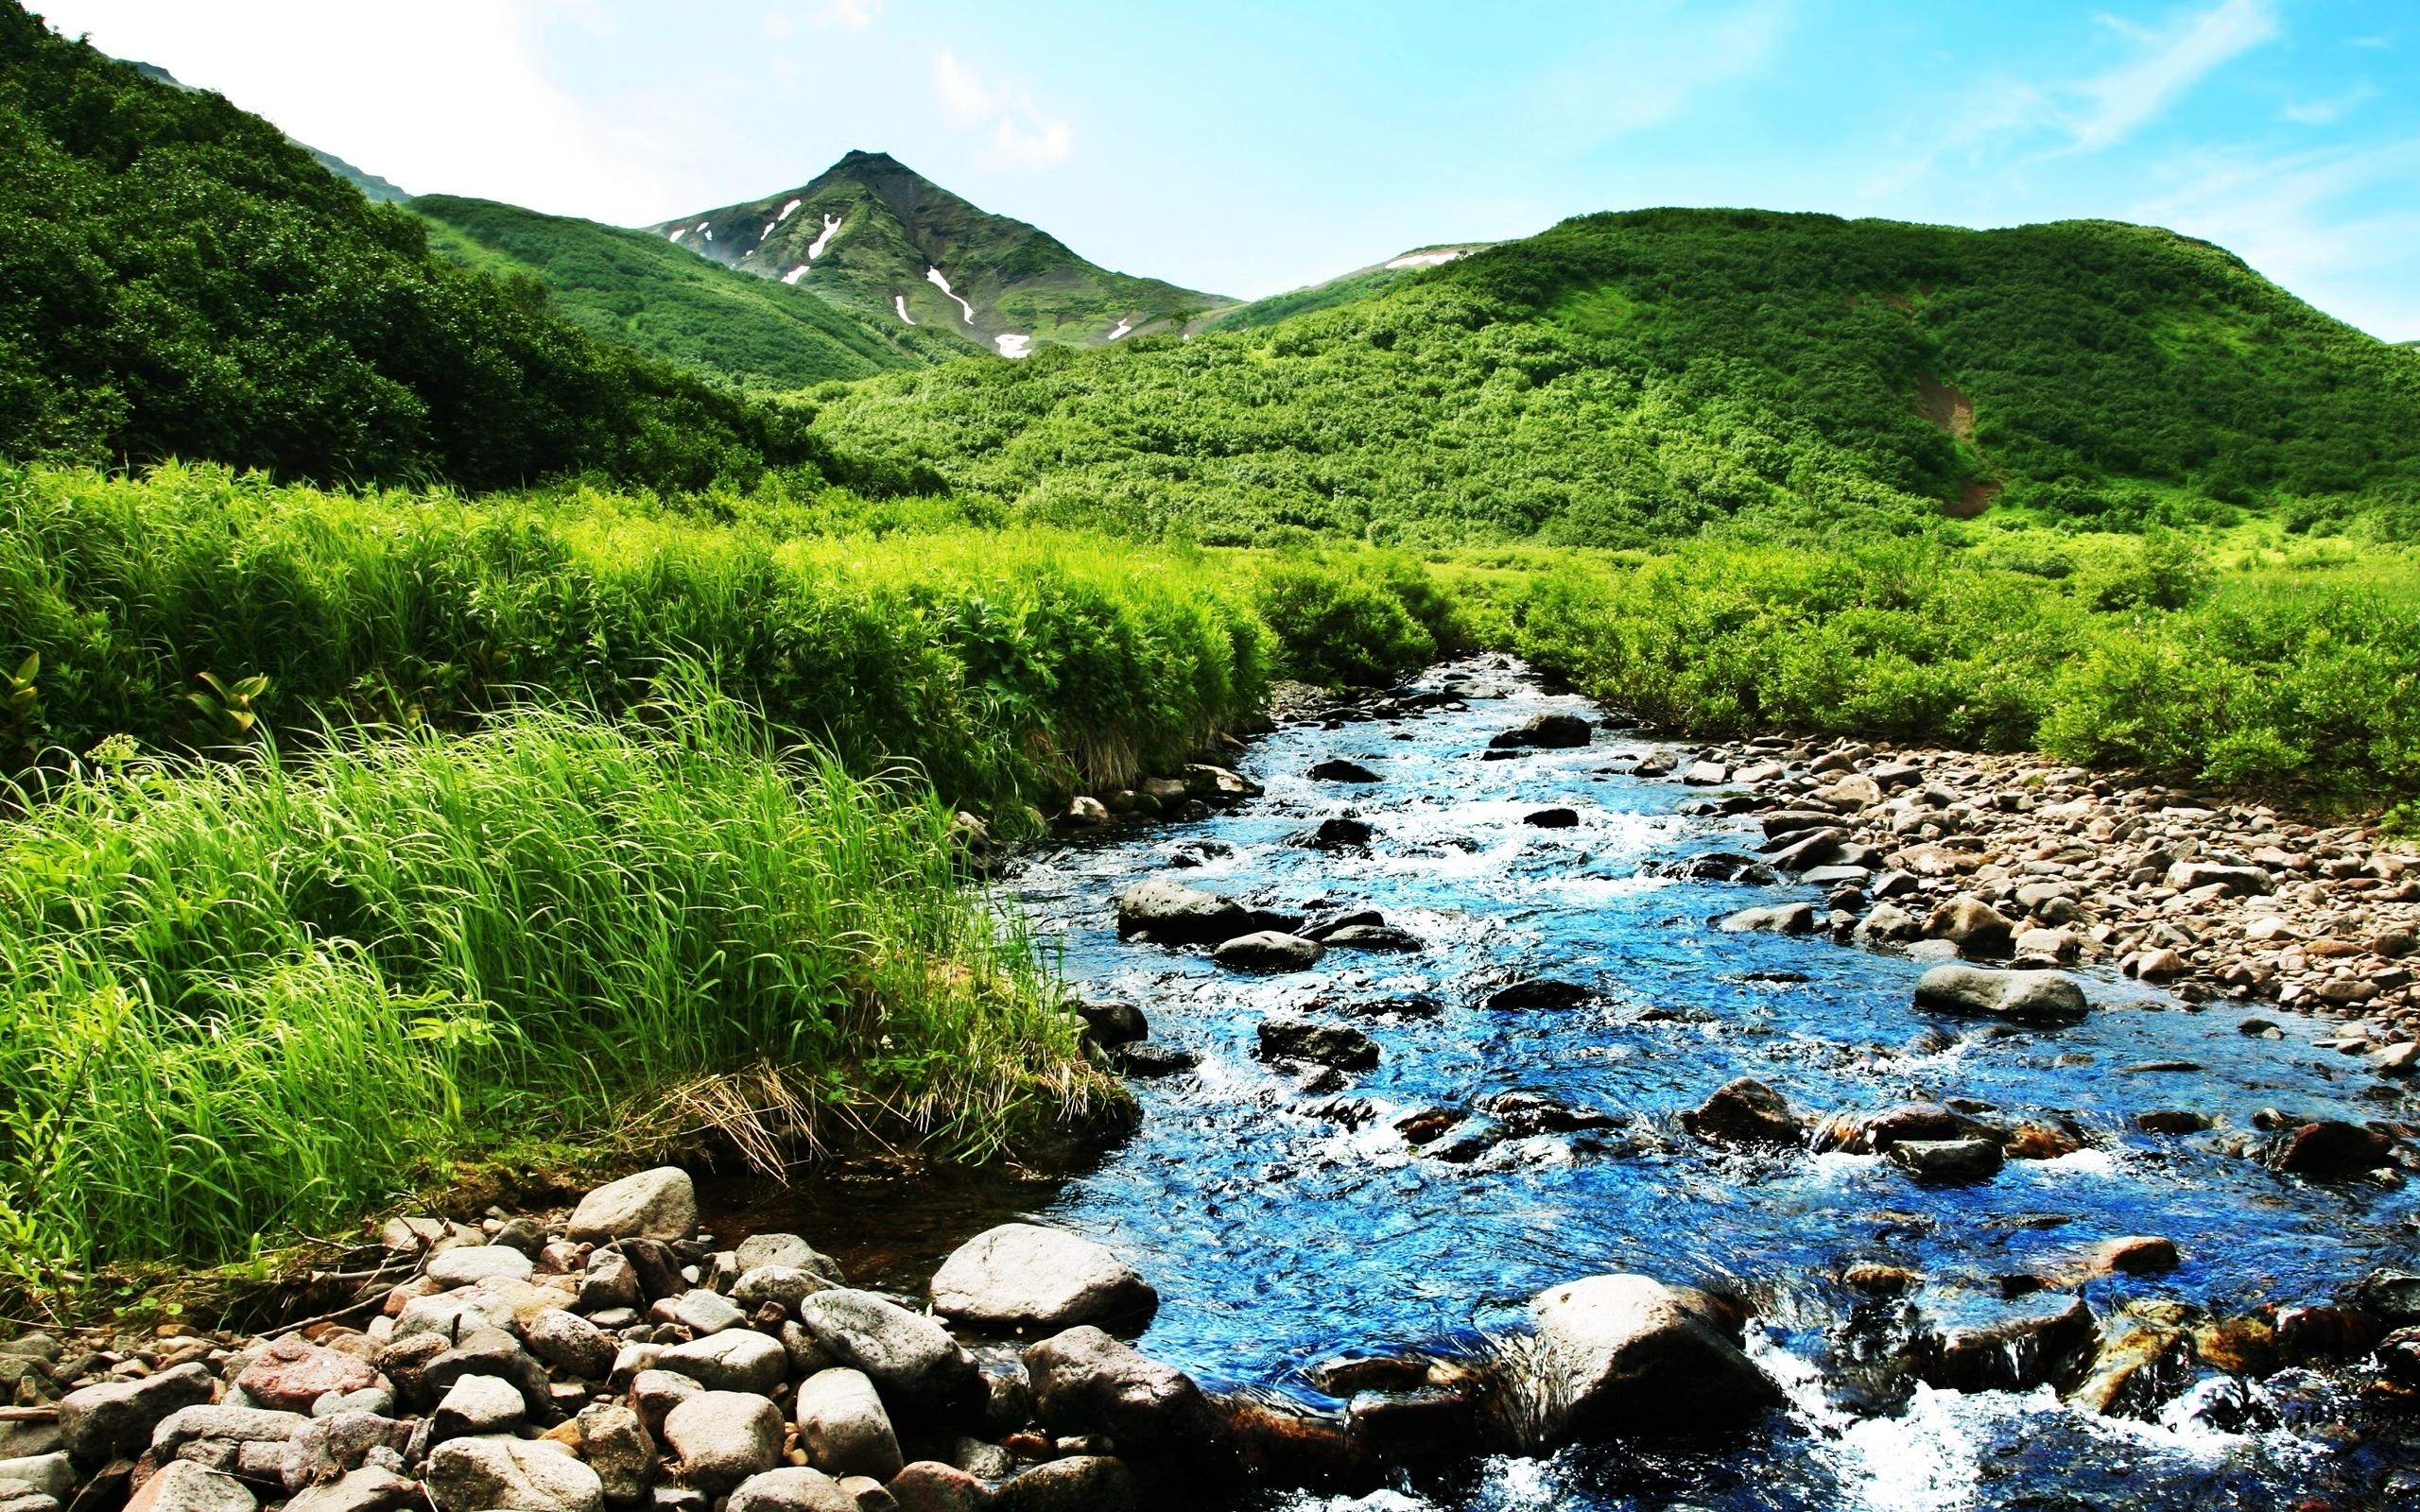 HD Mountain Stream Wallpaper - WallpaperSafari